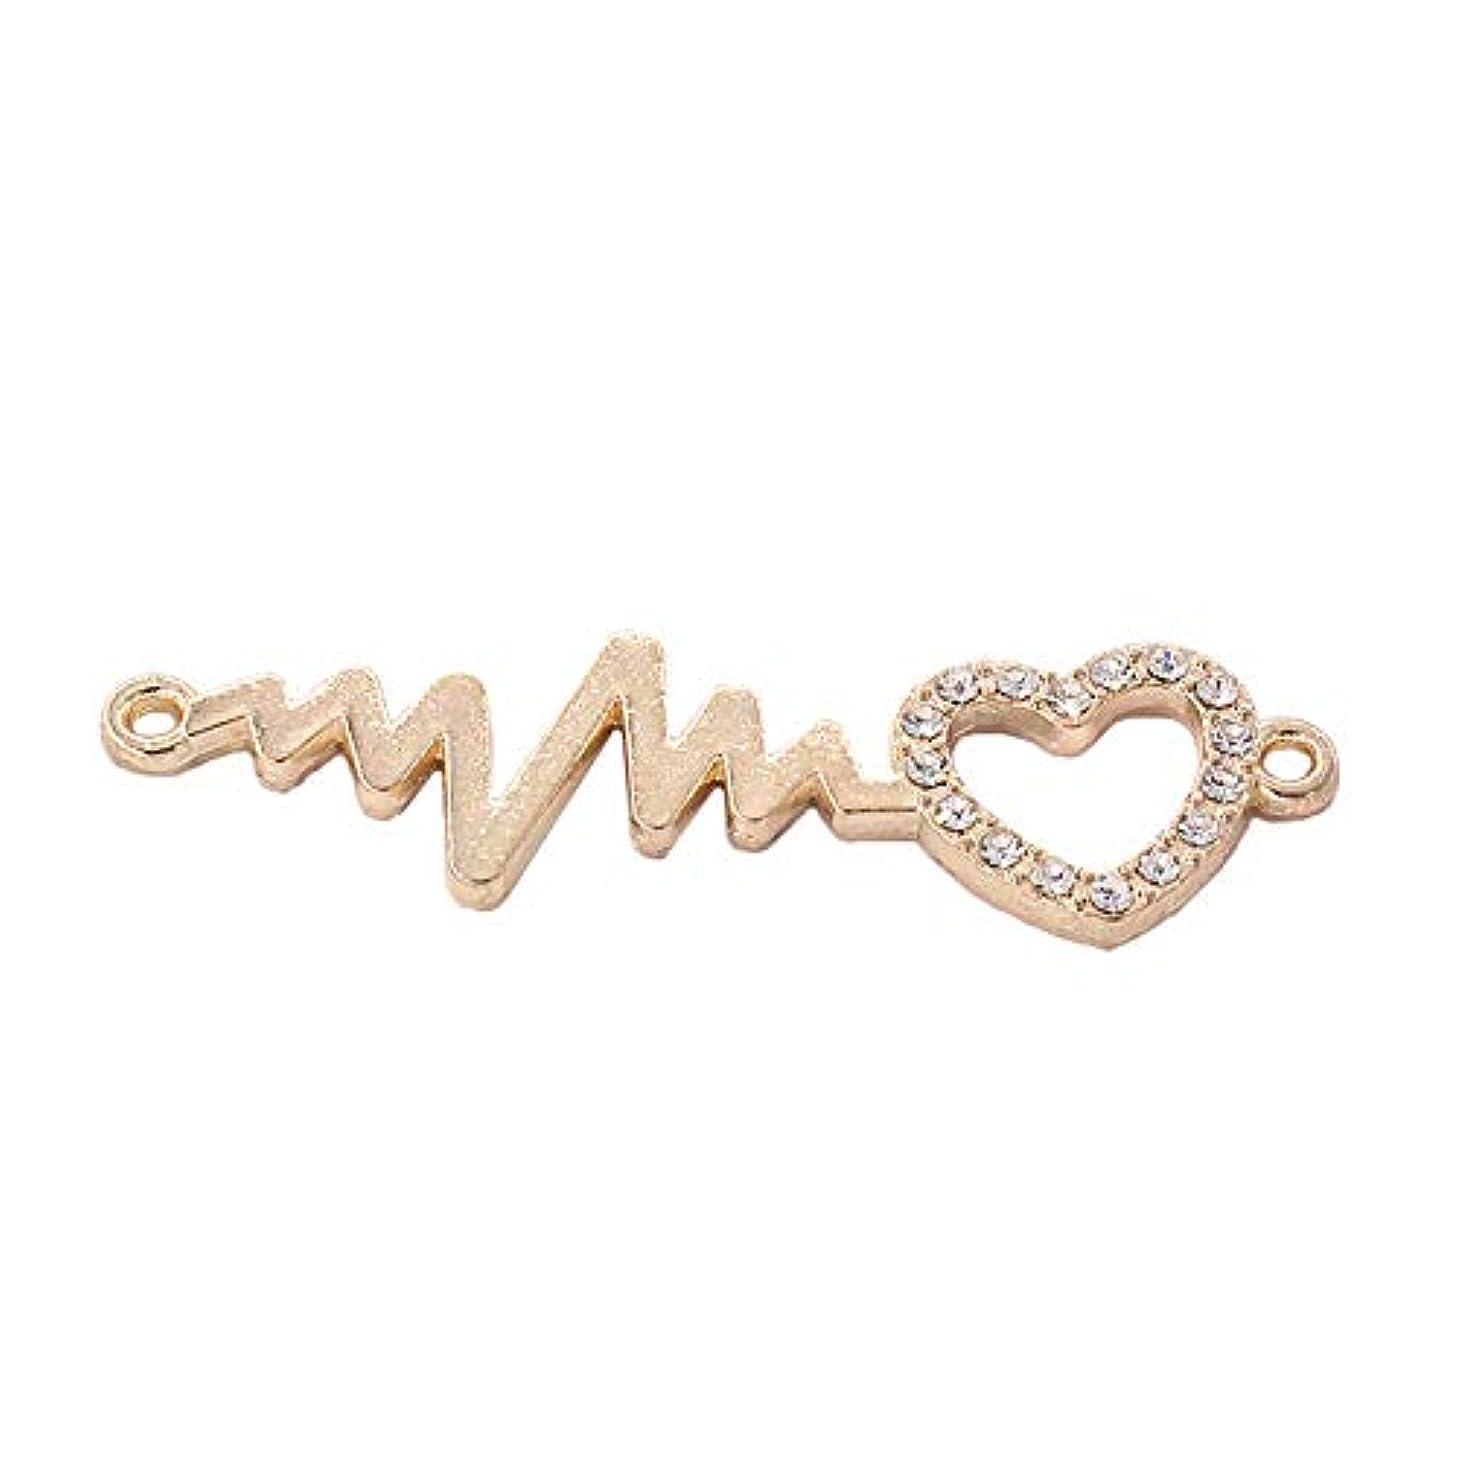 Golden Heart Shape Diamond Long Fold Shape Accessories Key Chain Bracelet Necklace Pendants for Mothers Day Gift